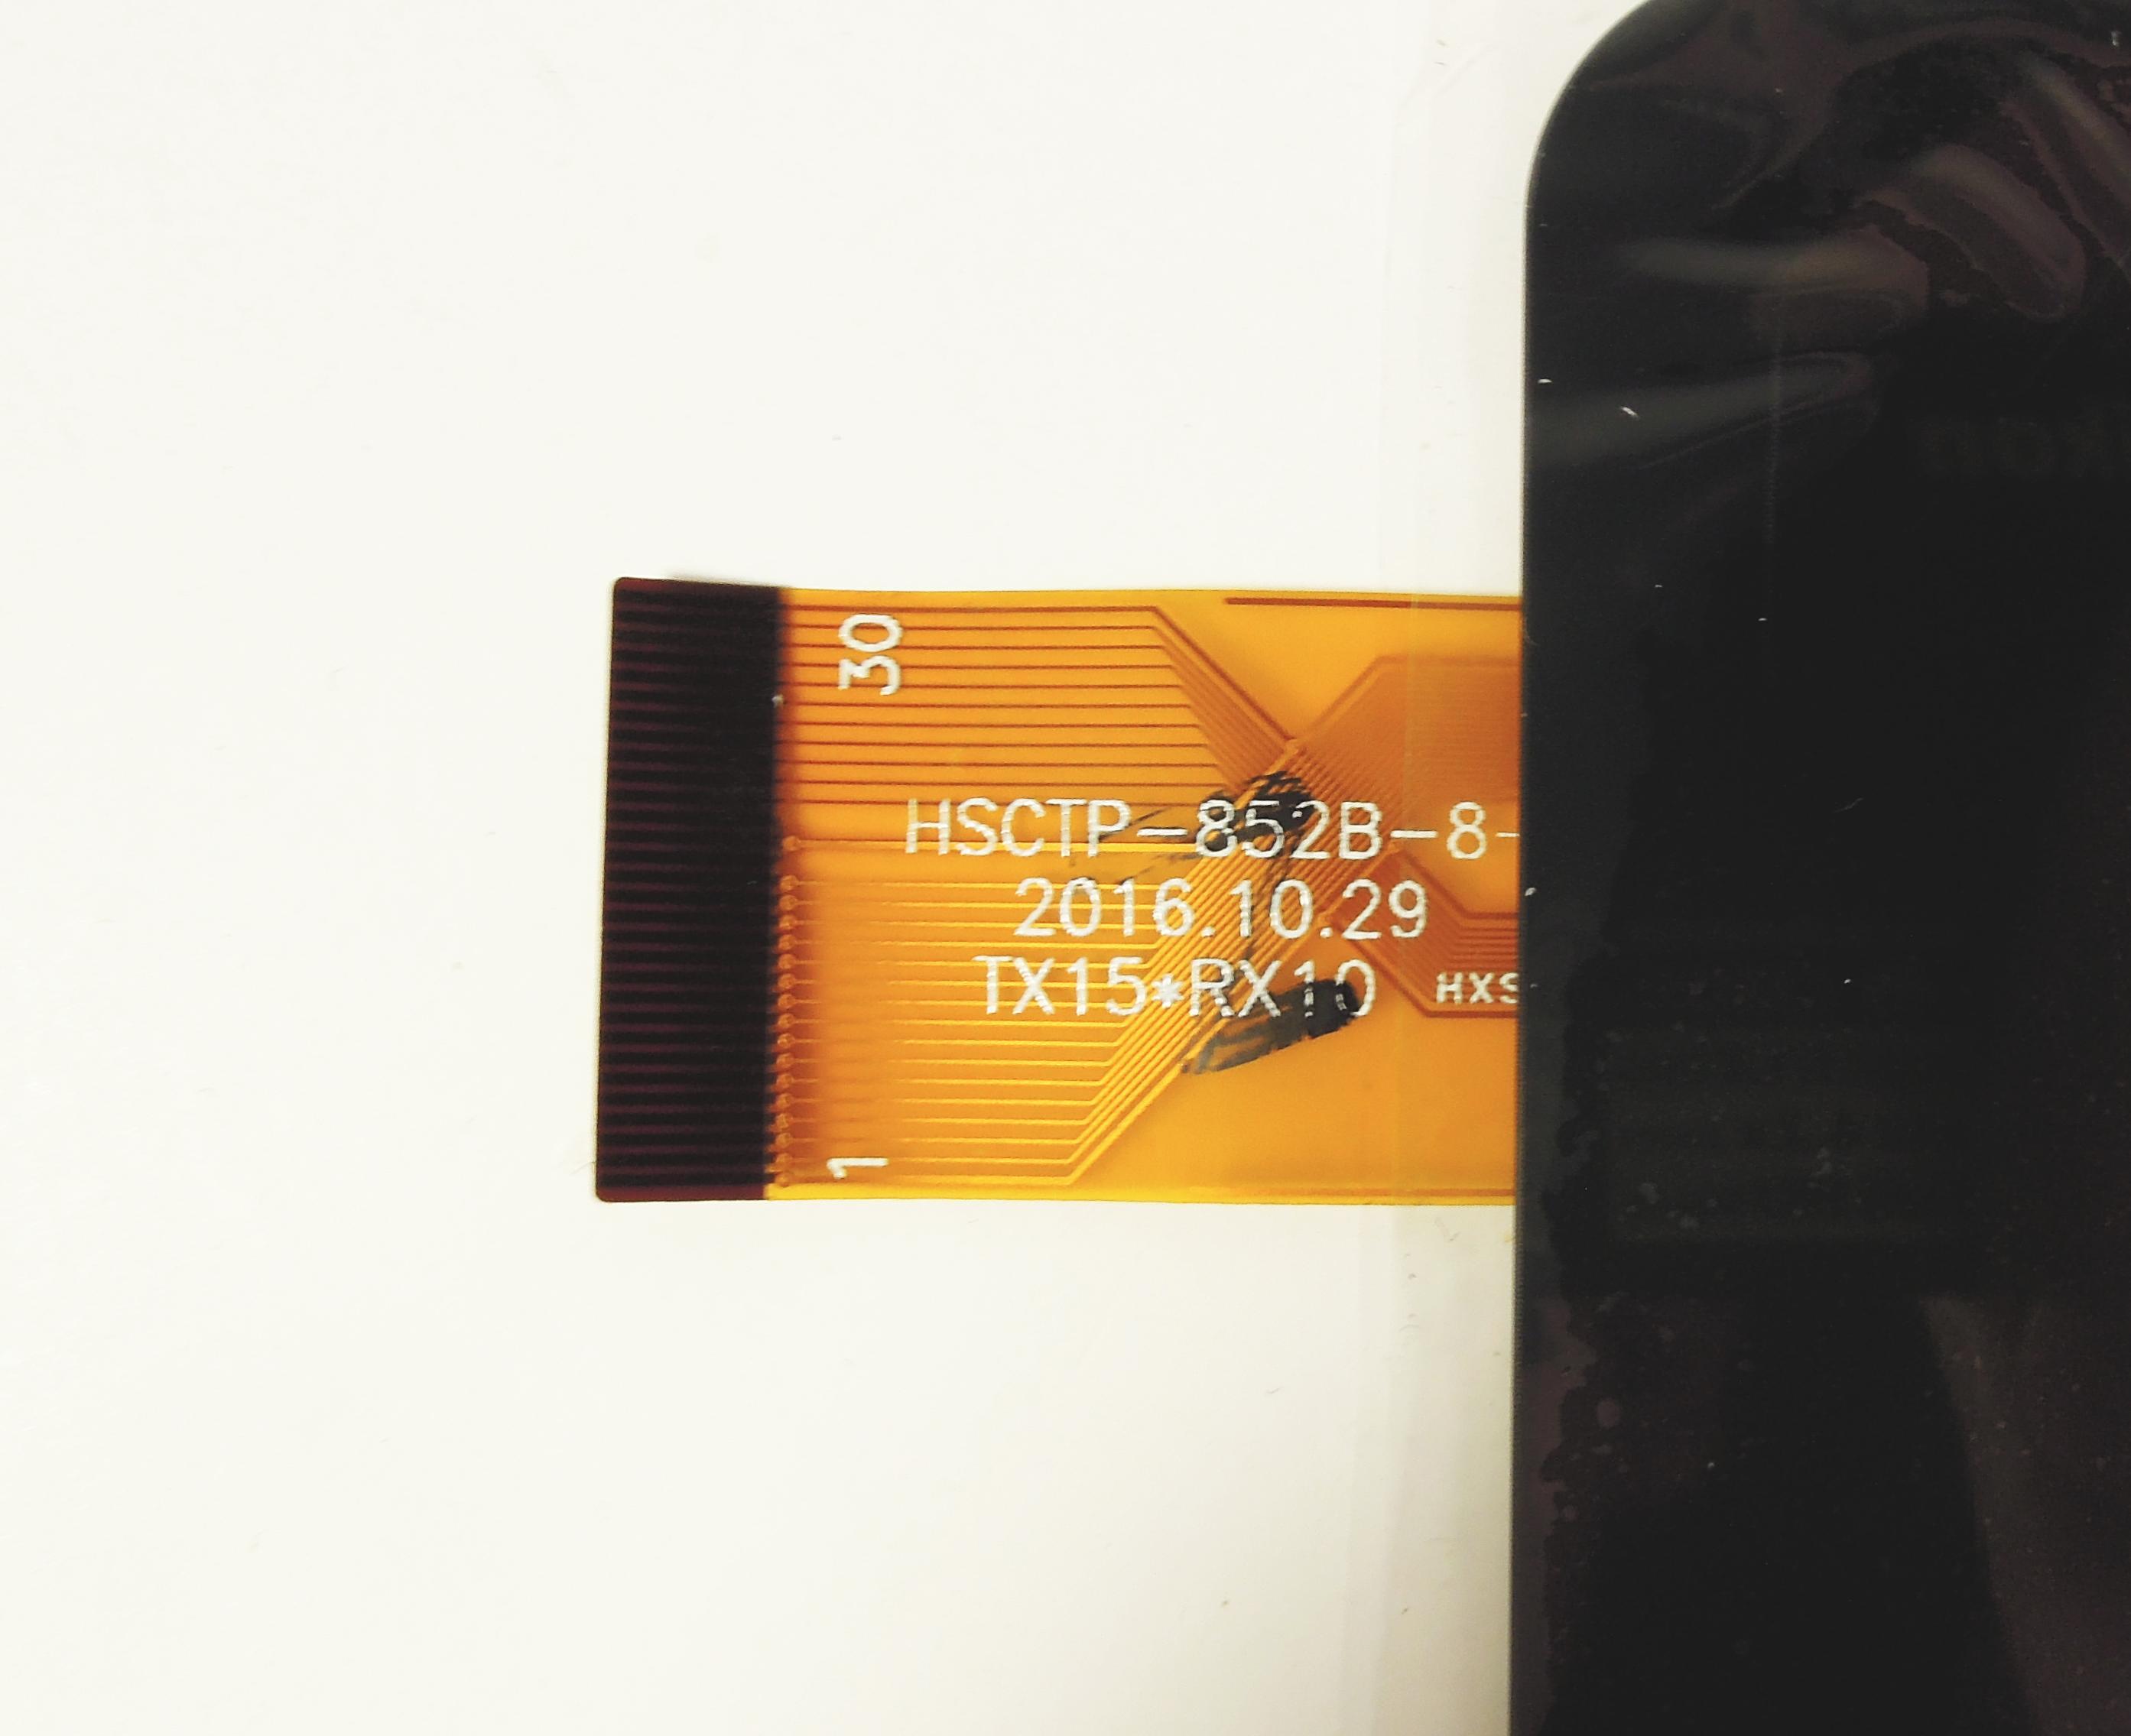 "Тачскрин 8.0"" China Tab (p/n HSCTP-852B-8-V0), 30 pin, чёрный"